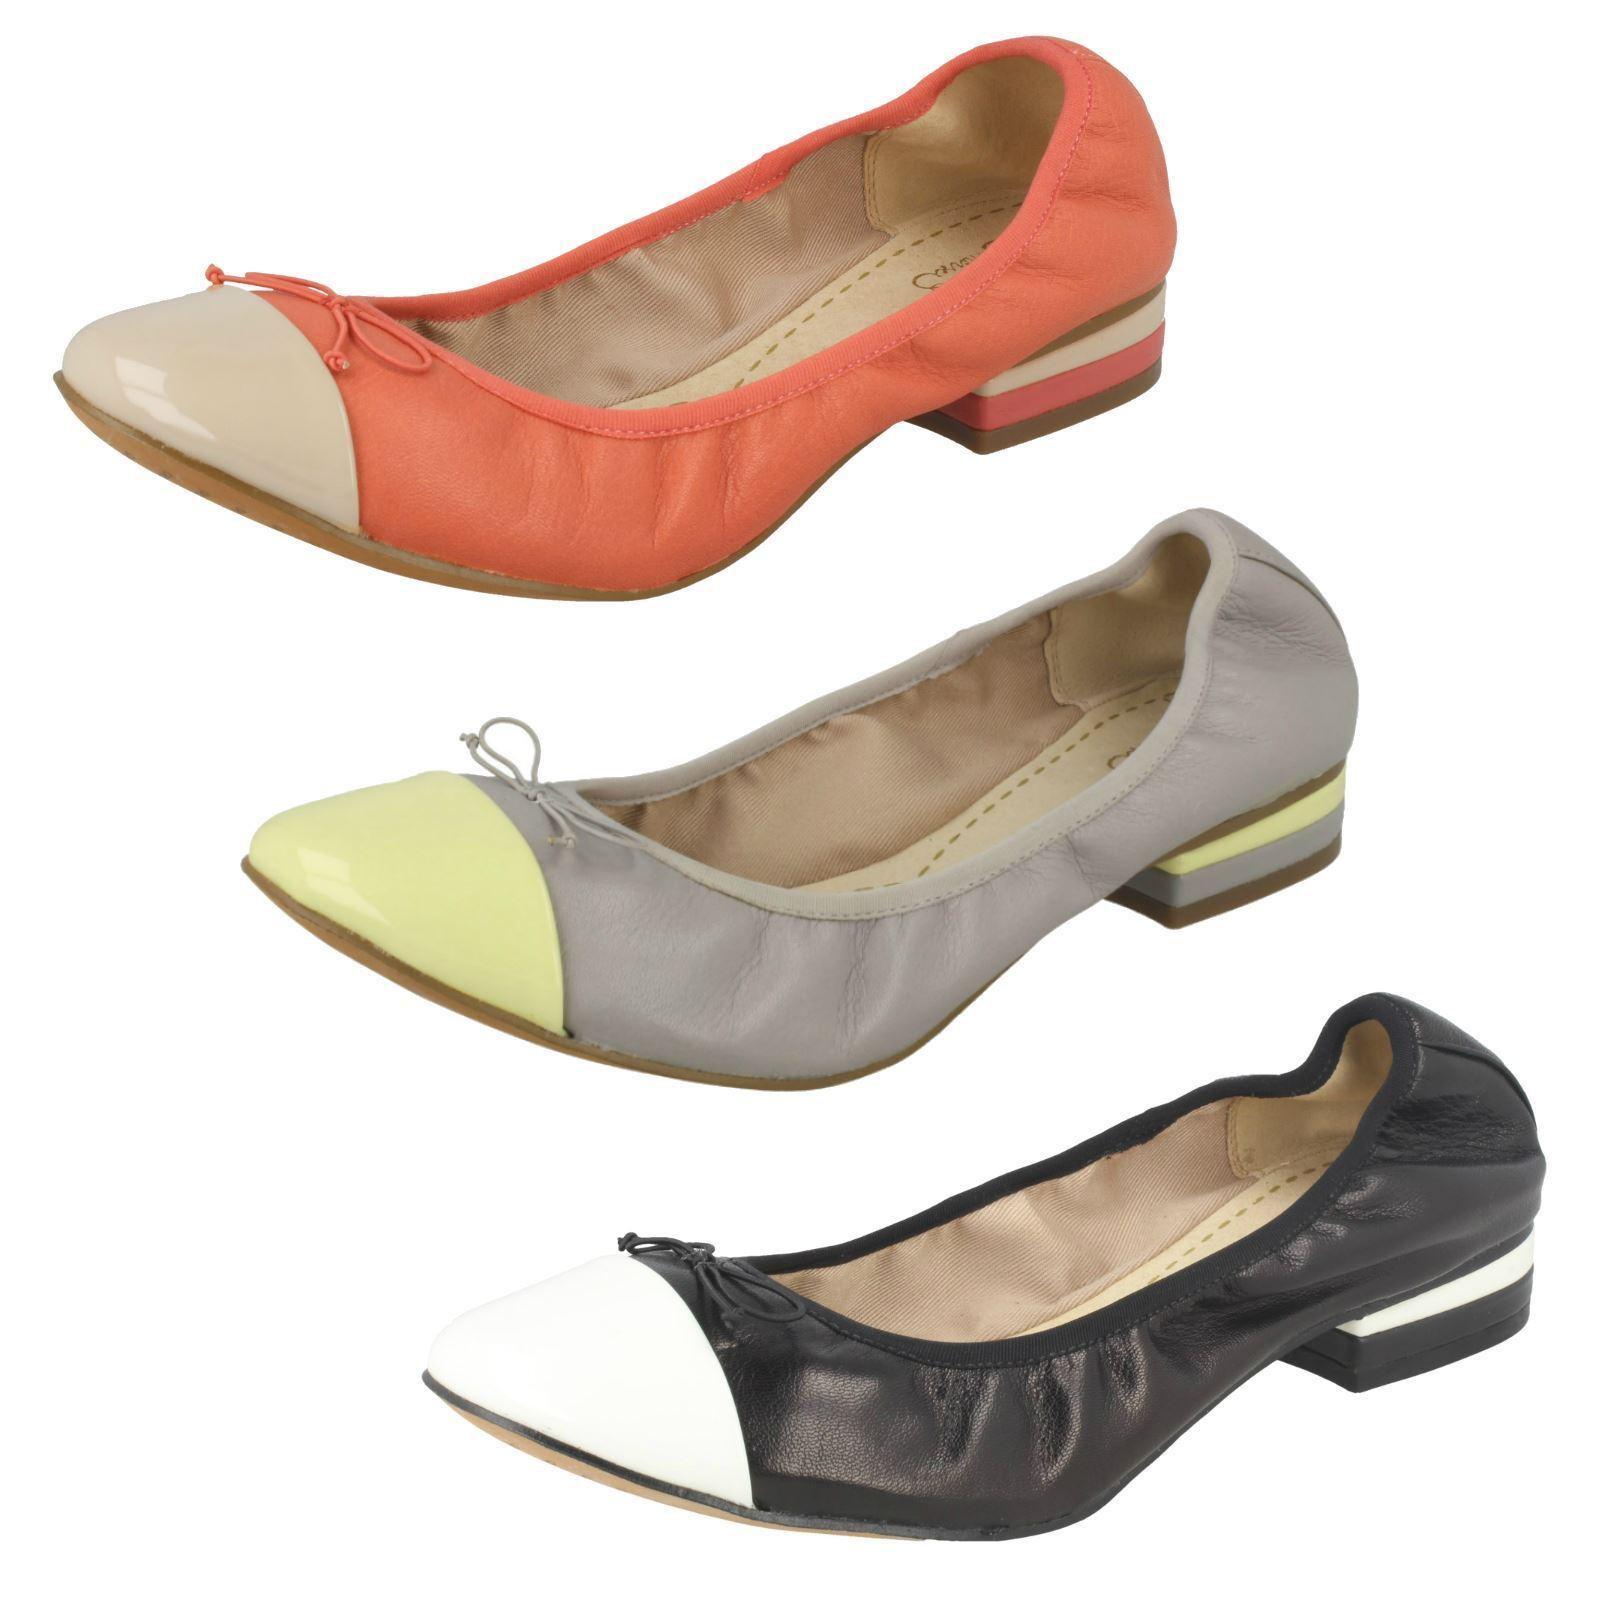 Clarks Zapatos Ditsy Vestido Damas Damas Damas informal Dolly  compra limitada